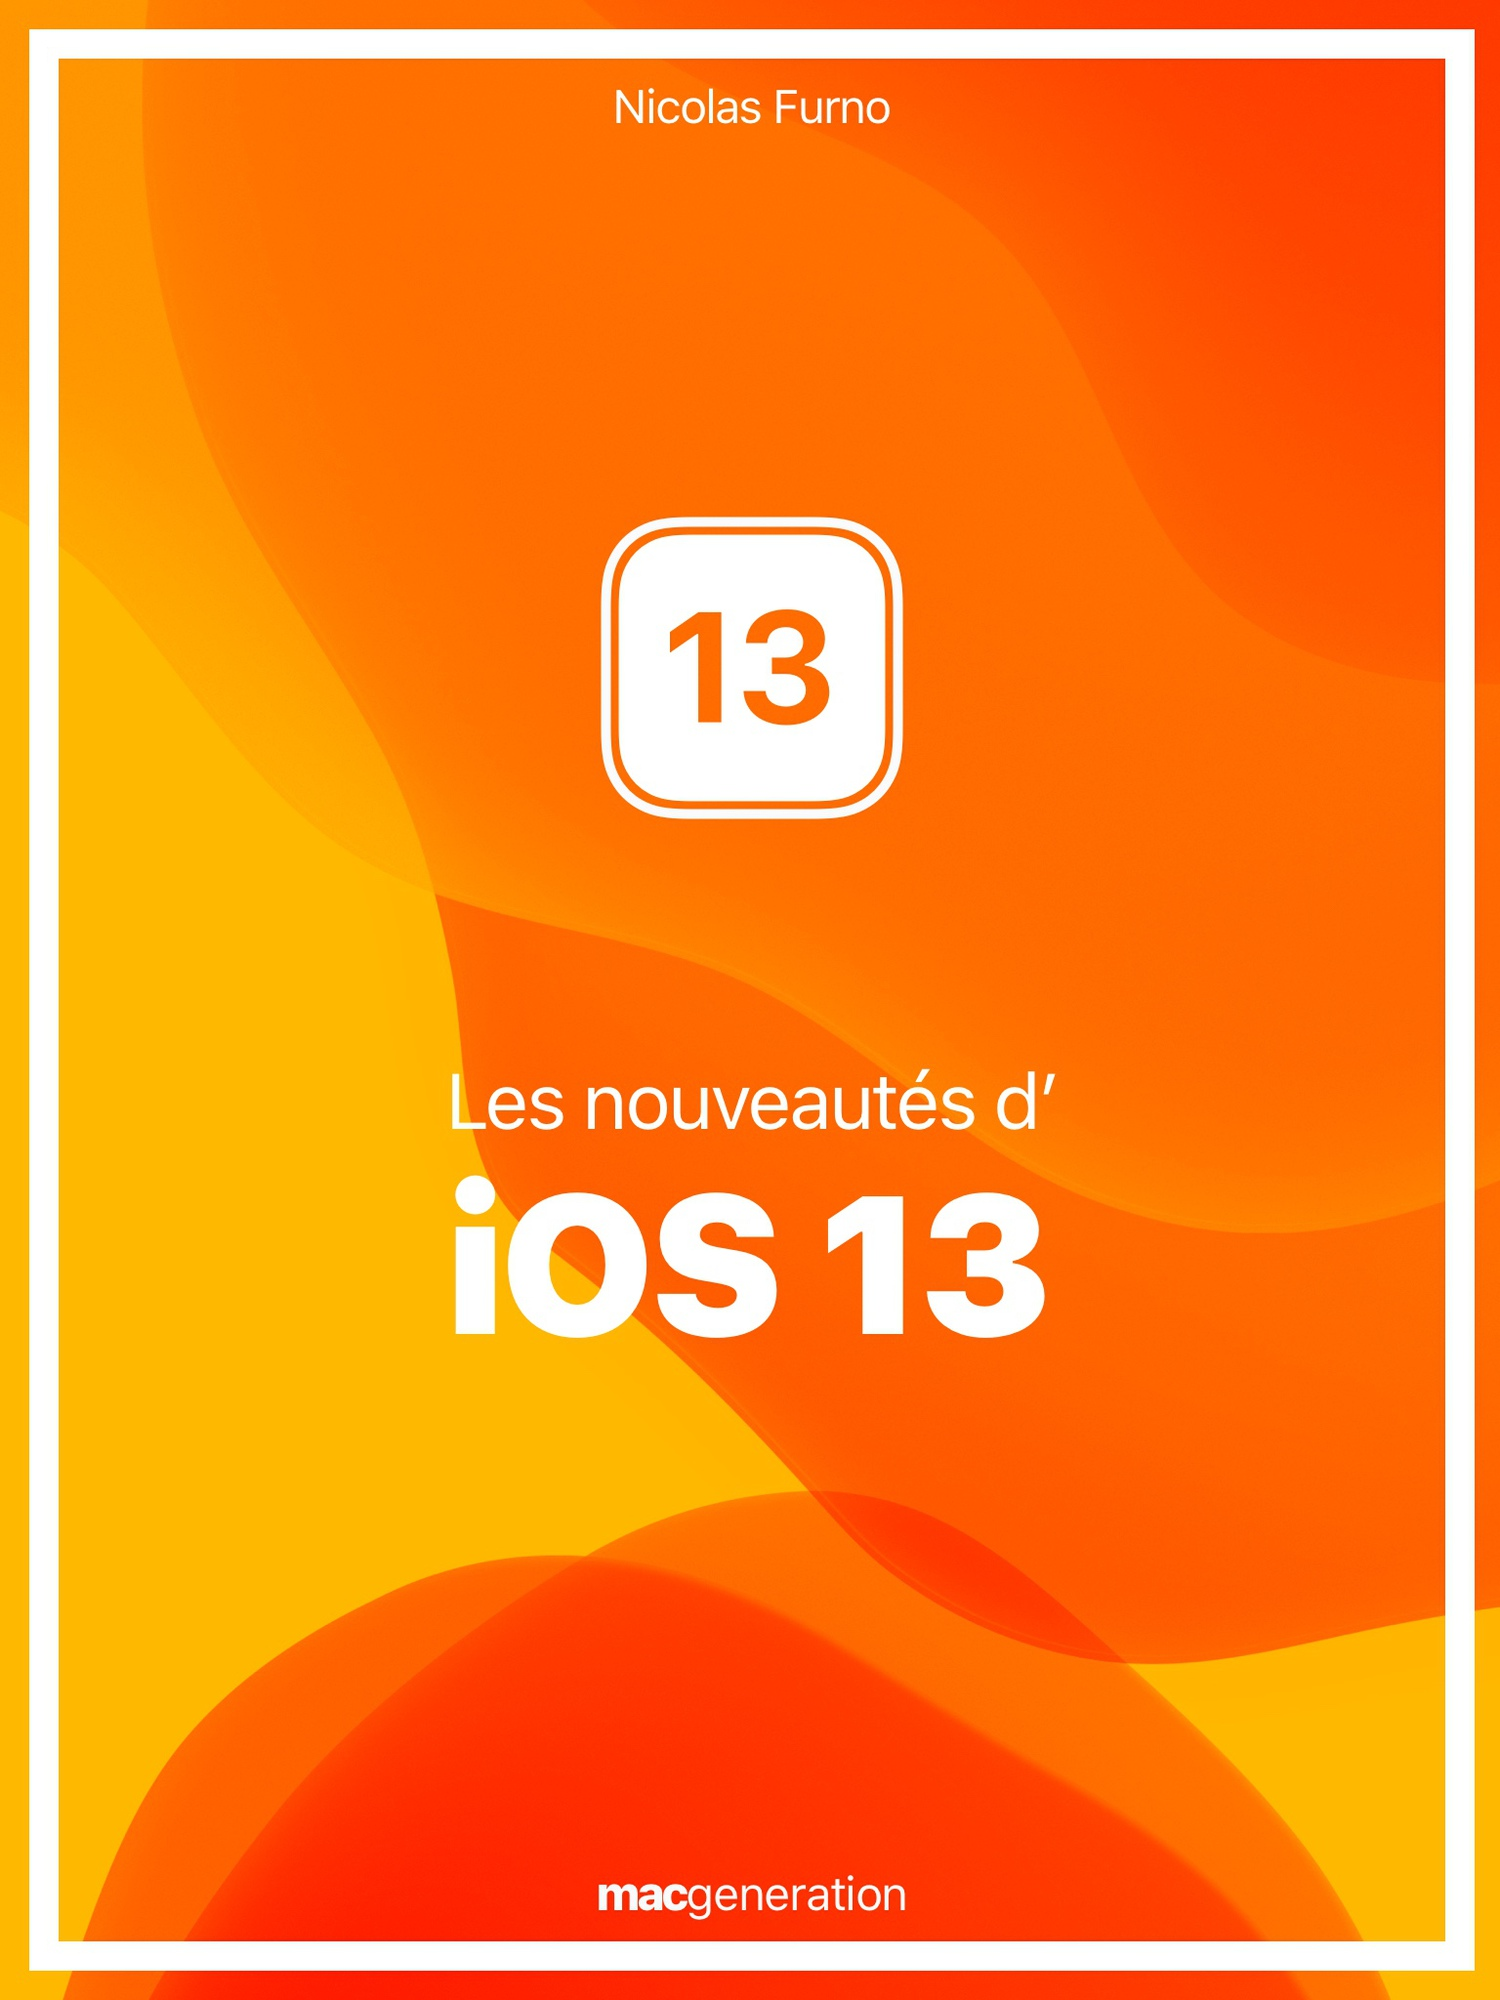 livres/ios-13.jpg